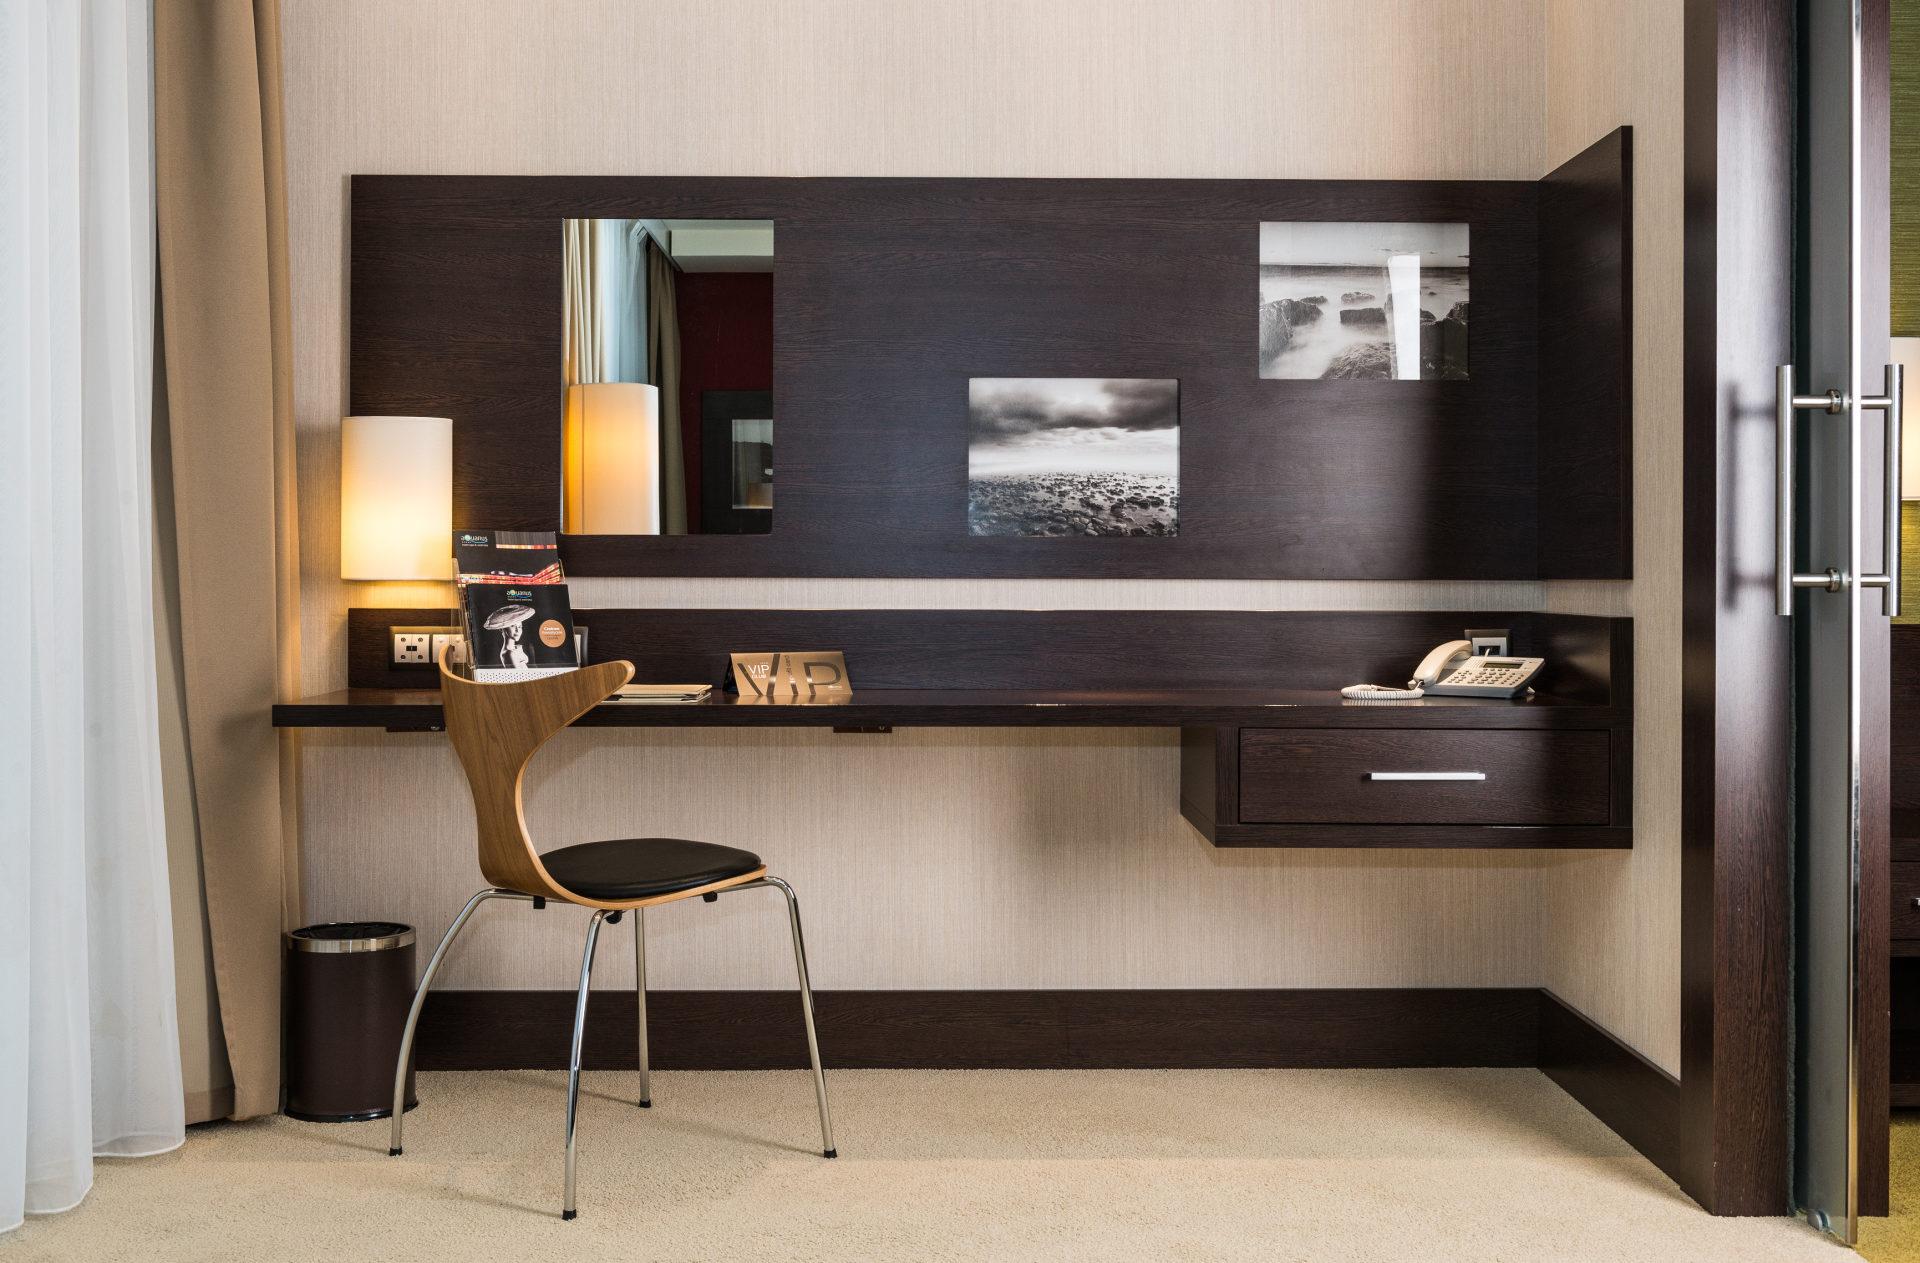 biurko w apartamencie